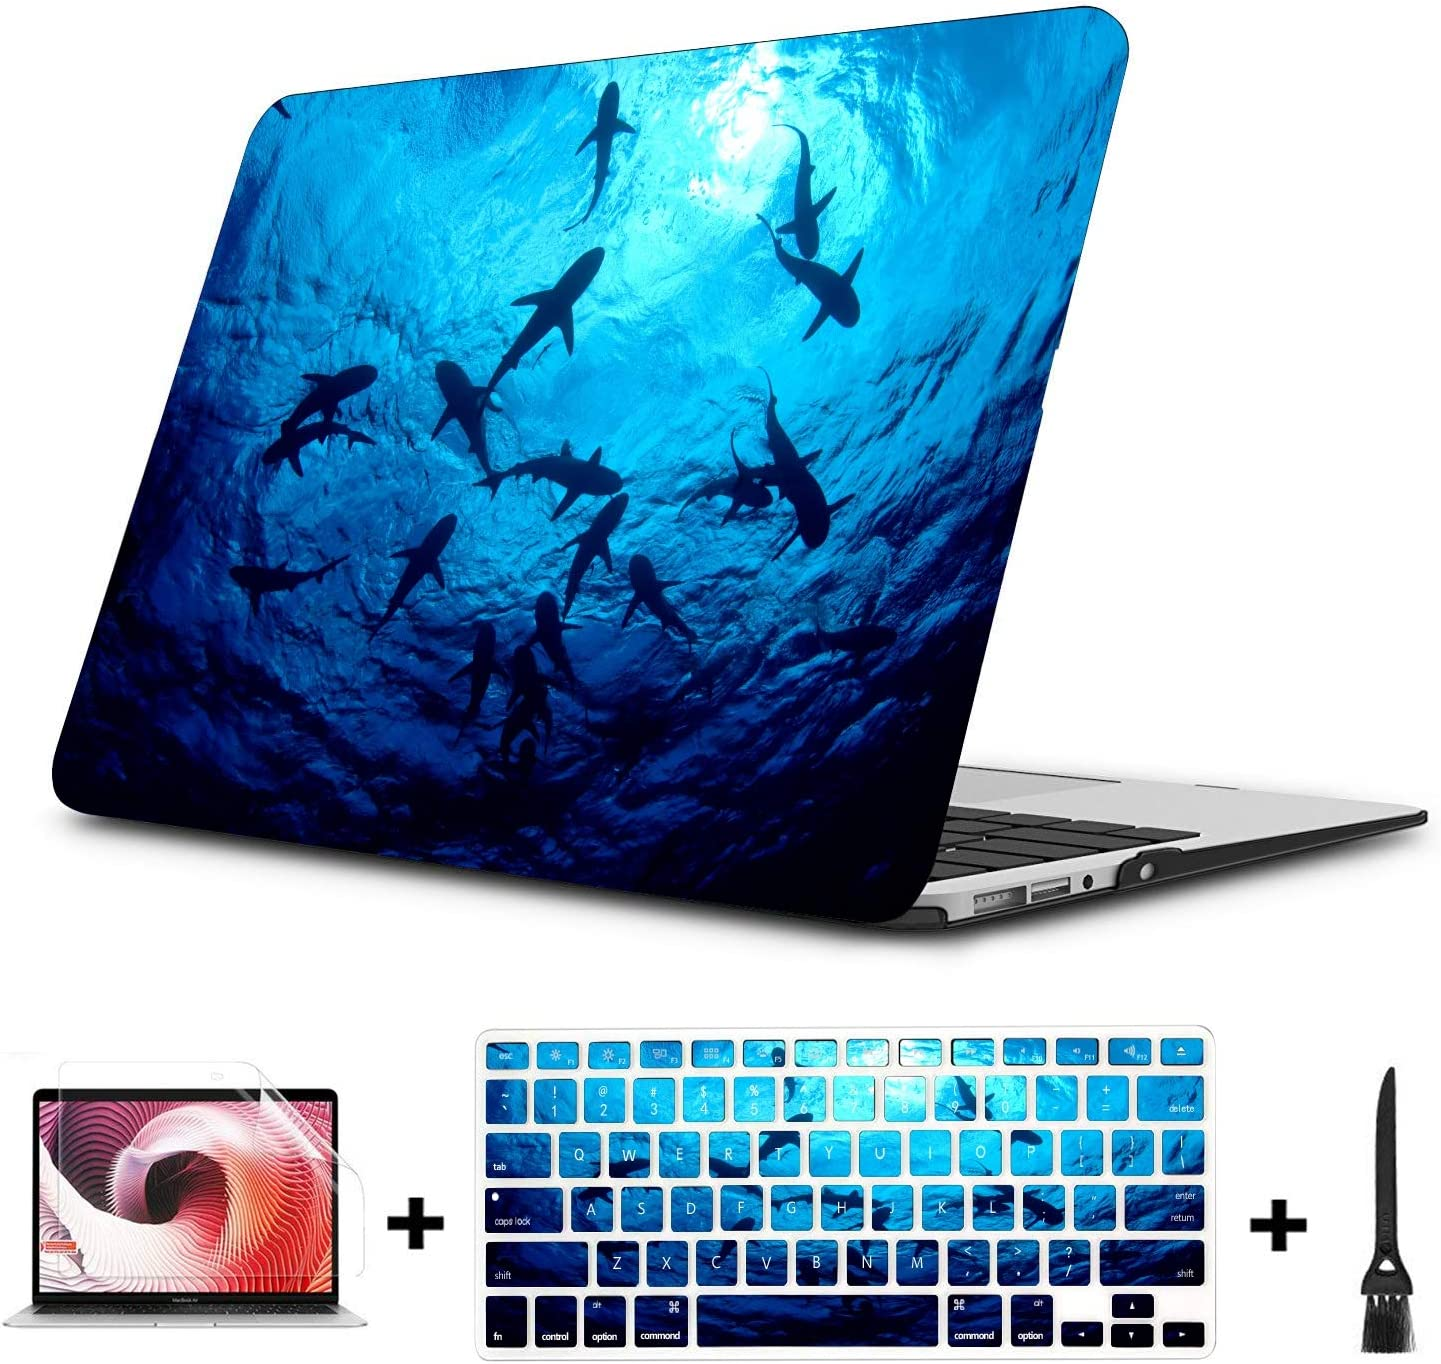 MacBook Computer Case Sea Creatures Ornamental Fish Squid Plastic Hard Shell Compatible Mac Air 11 Pro 13 15 Laptop Pro Accessories Protection for MacBook 2016-2019 Version